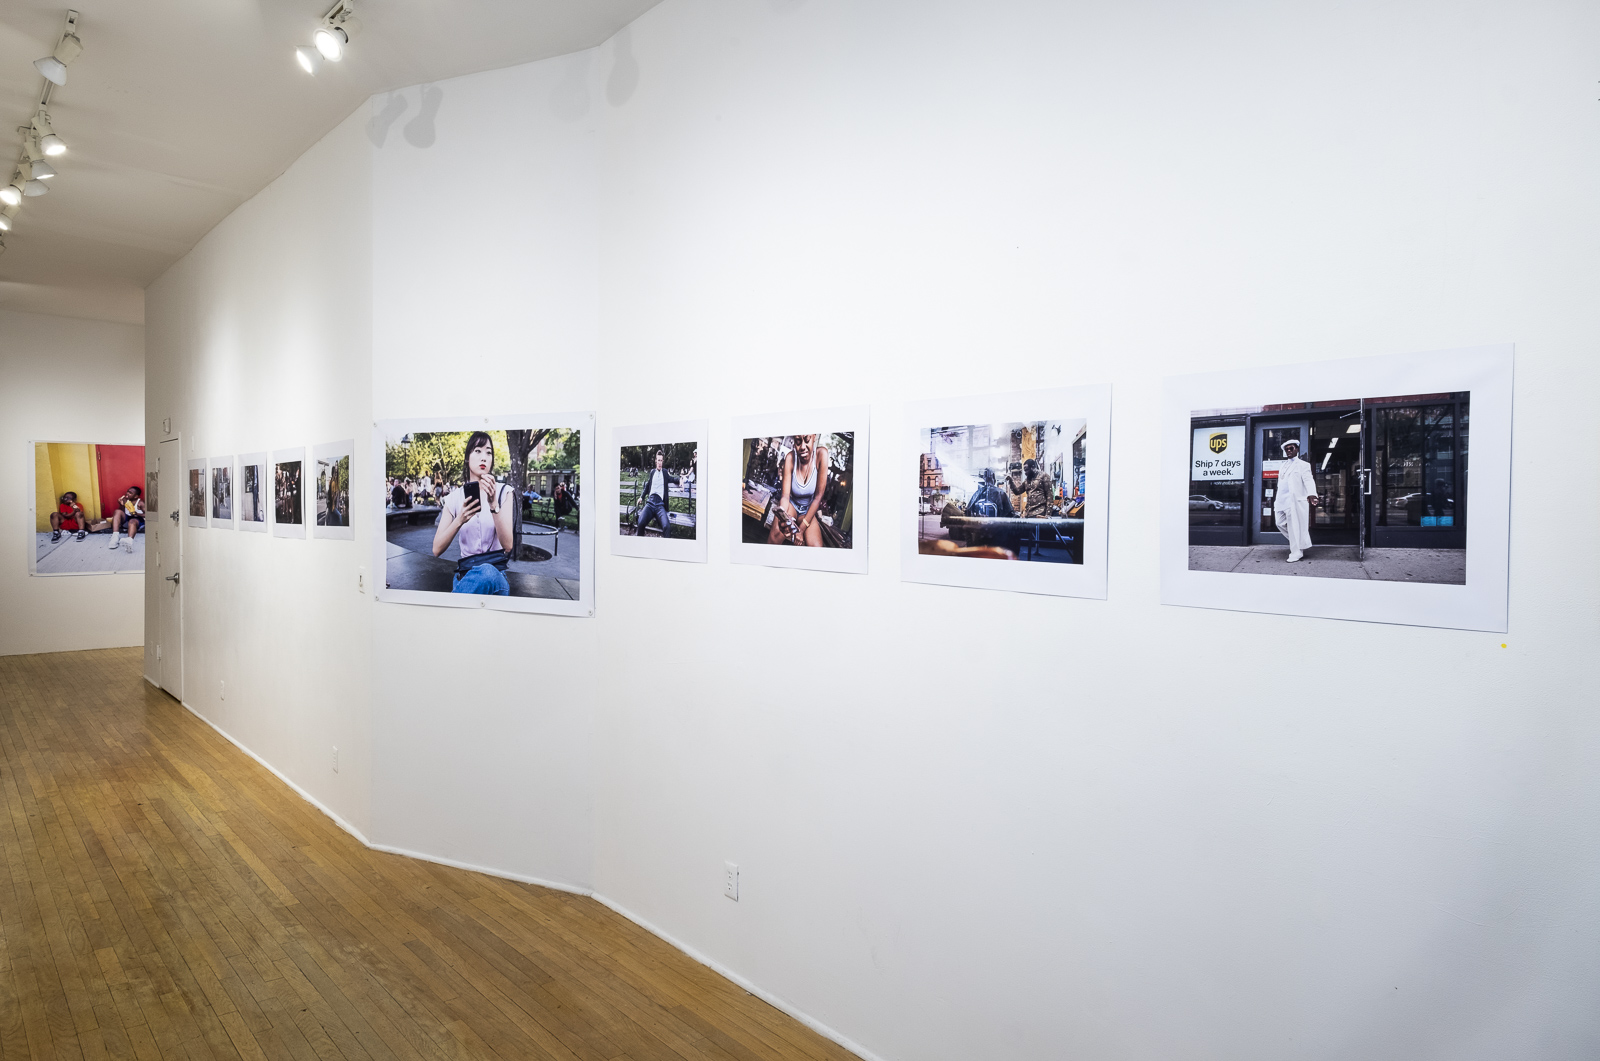 Surreptitious Installation, 2018